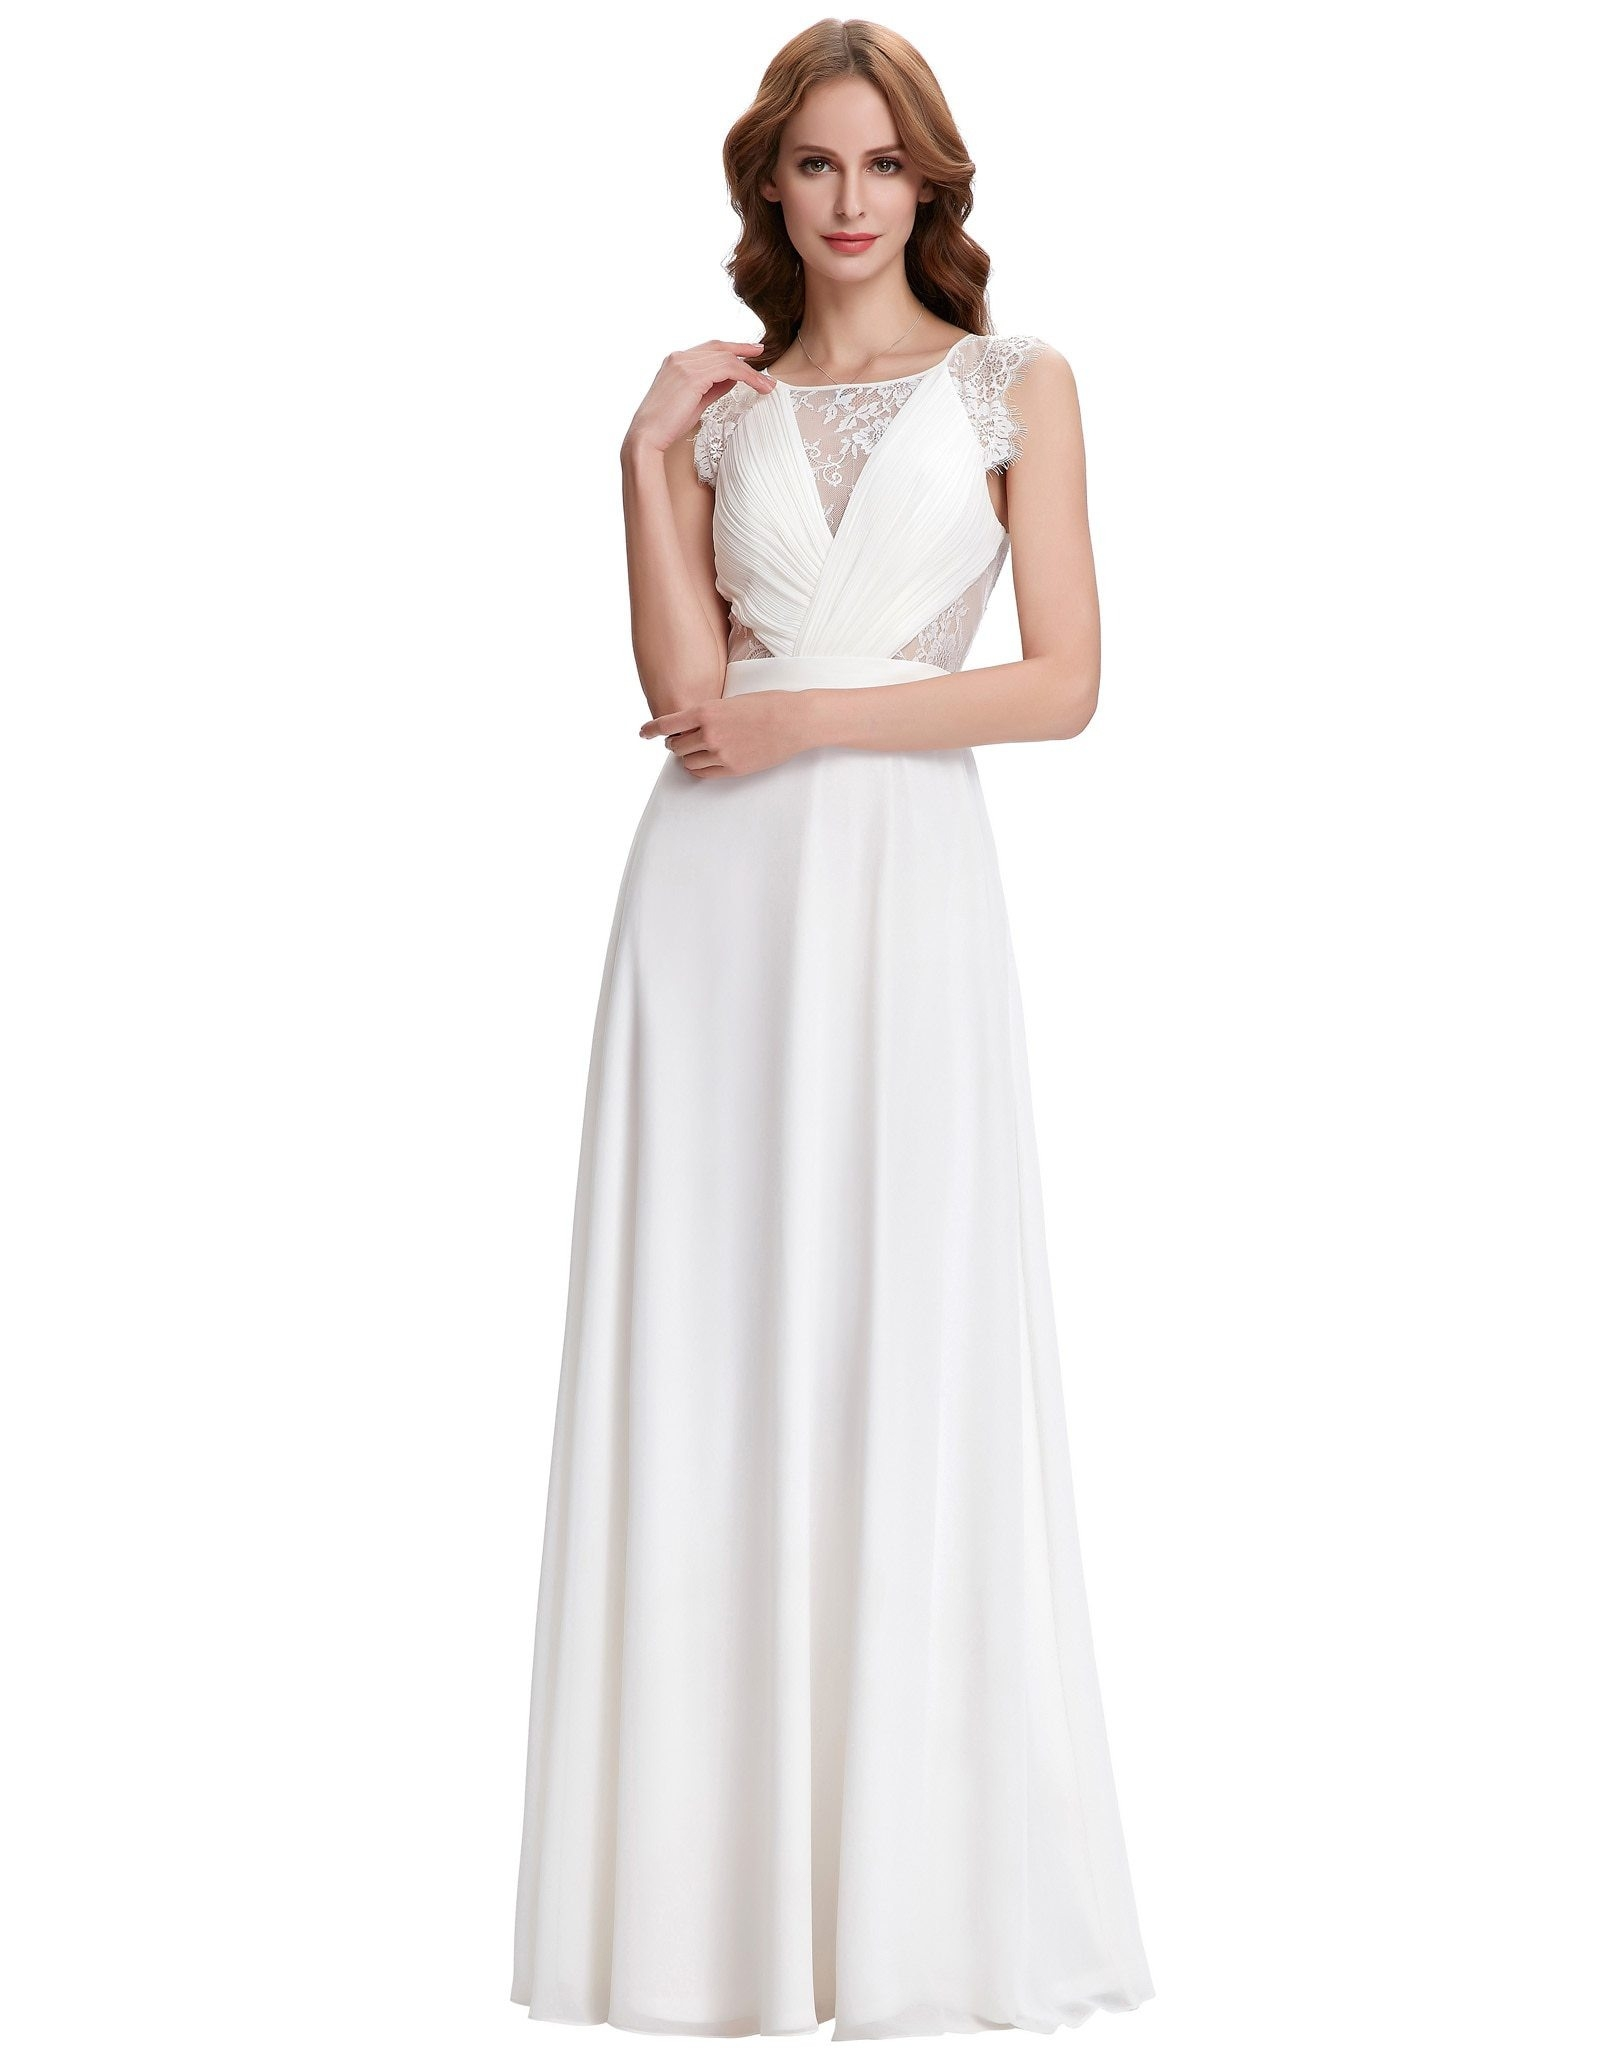 17 Genial Kleid Lang Spitze Stylish20 Schön Kleid Lang Spitze Design